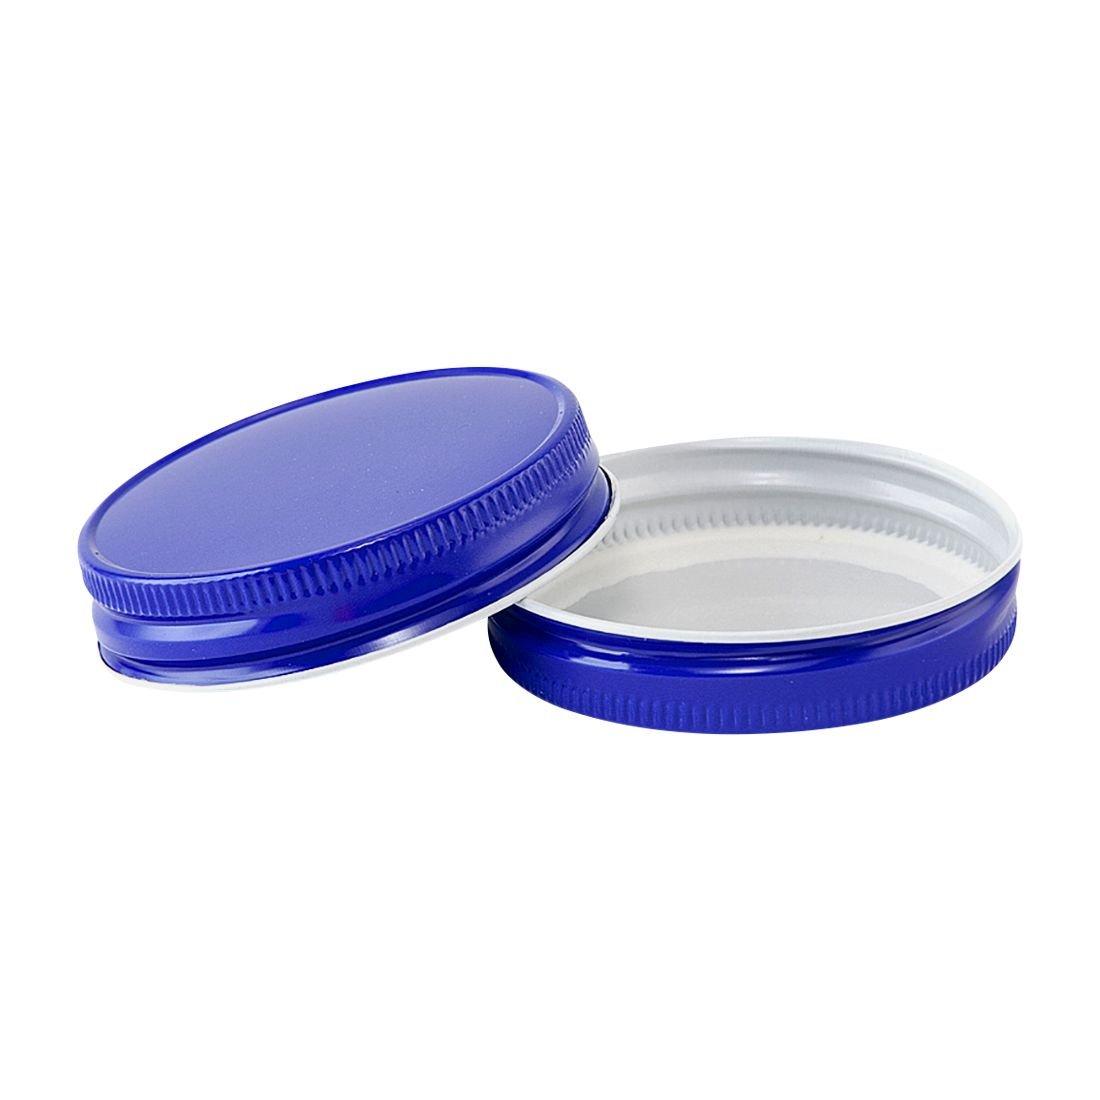 North Mountain Supply Regular Mouth Metal One Piece Mason Jar Lids - Flat Top - Pack of 72 - Royal Blue